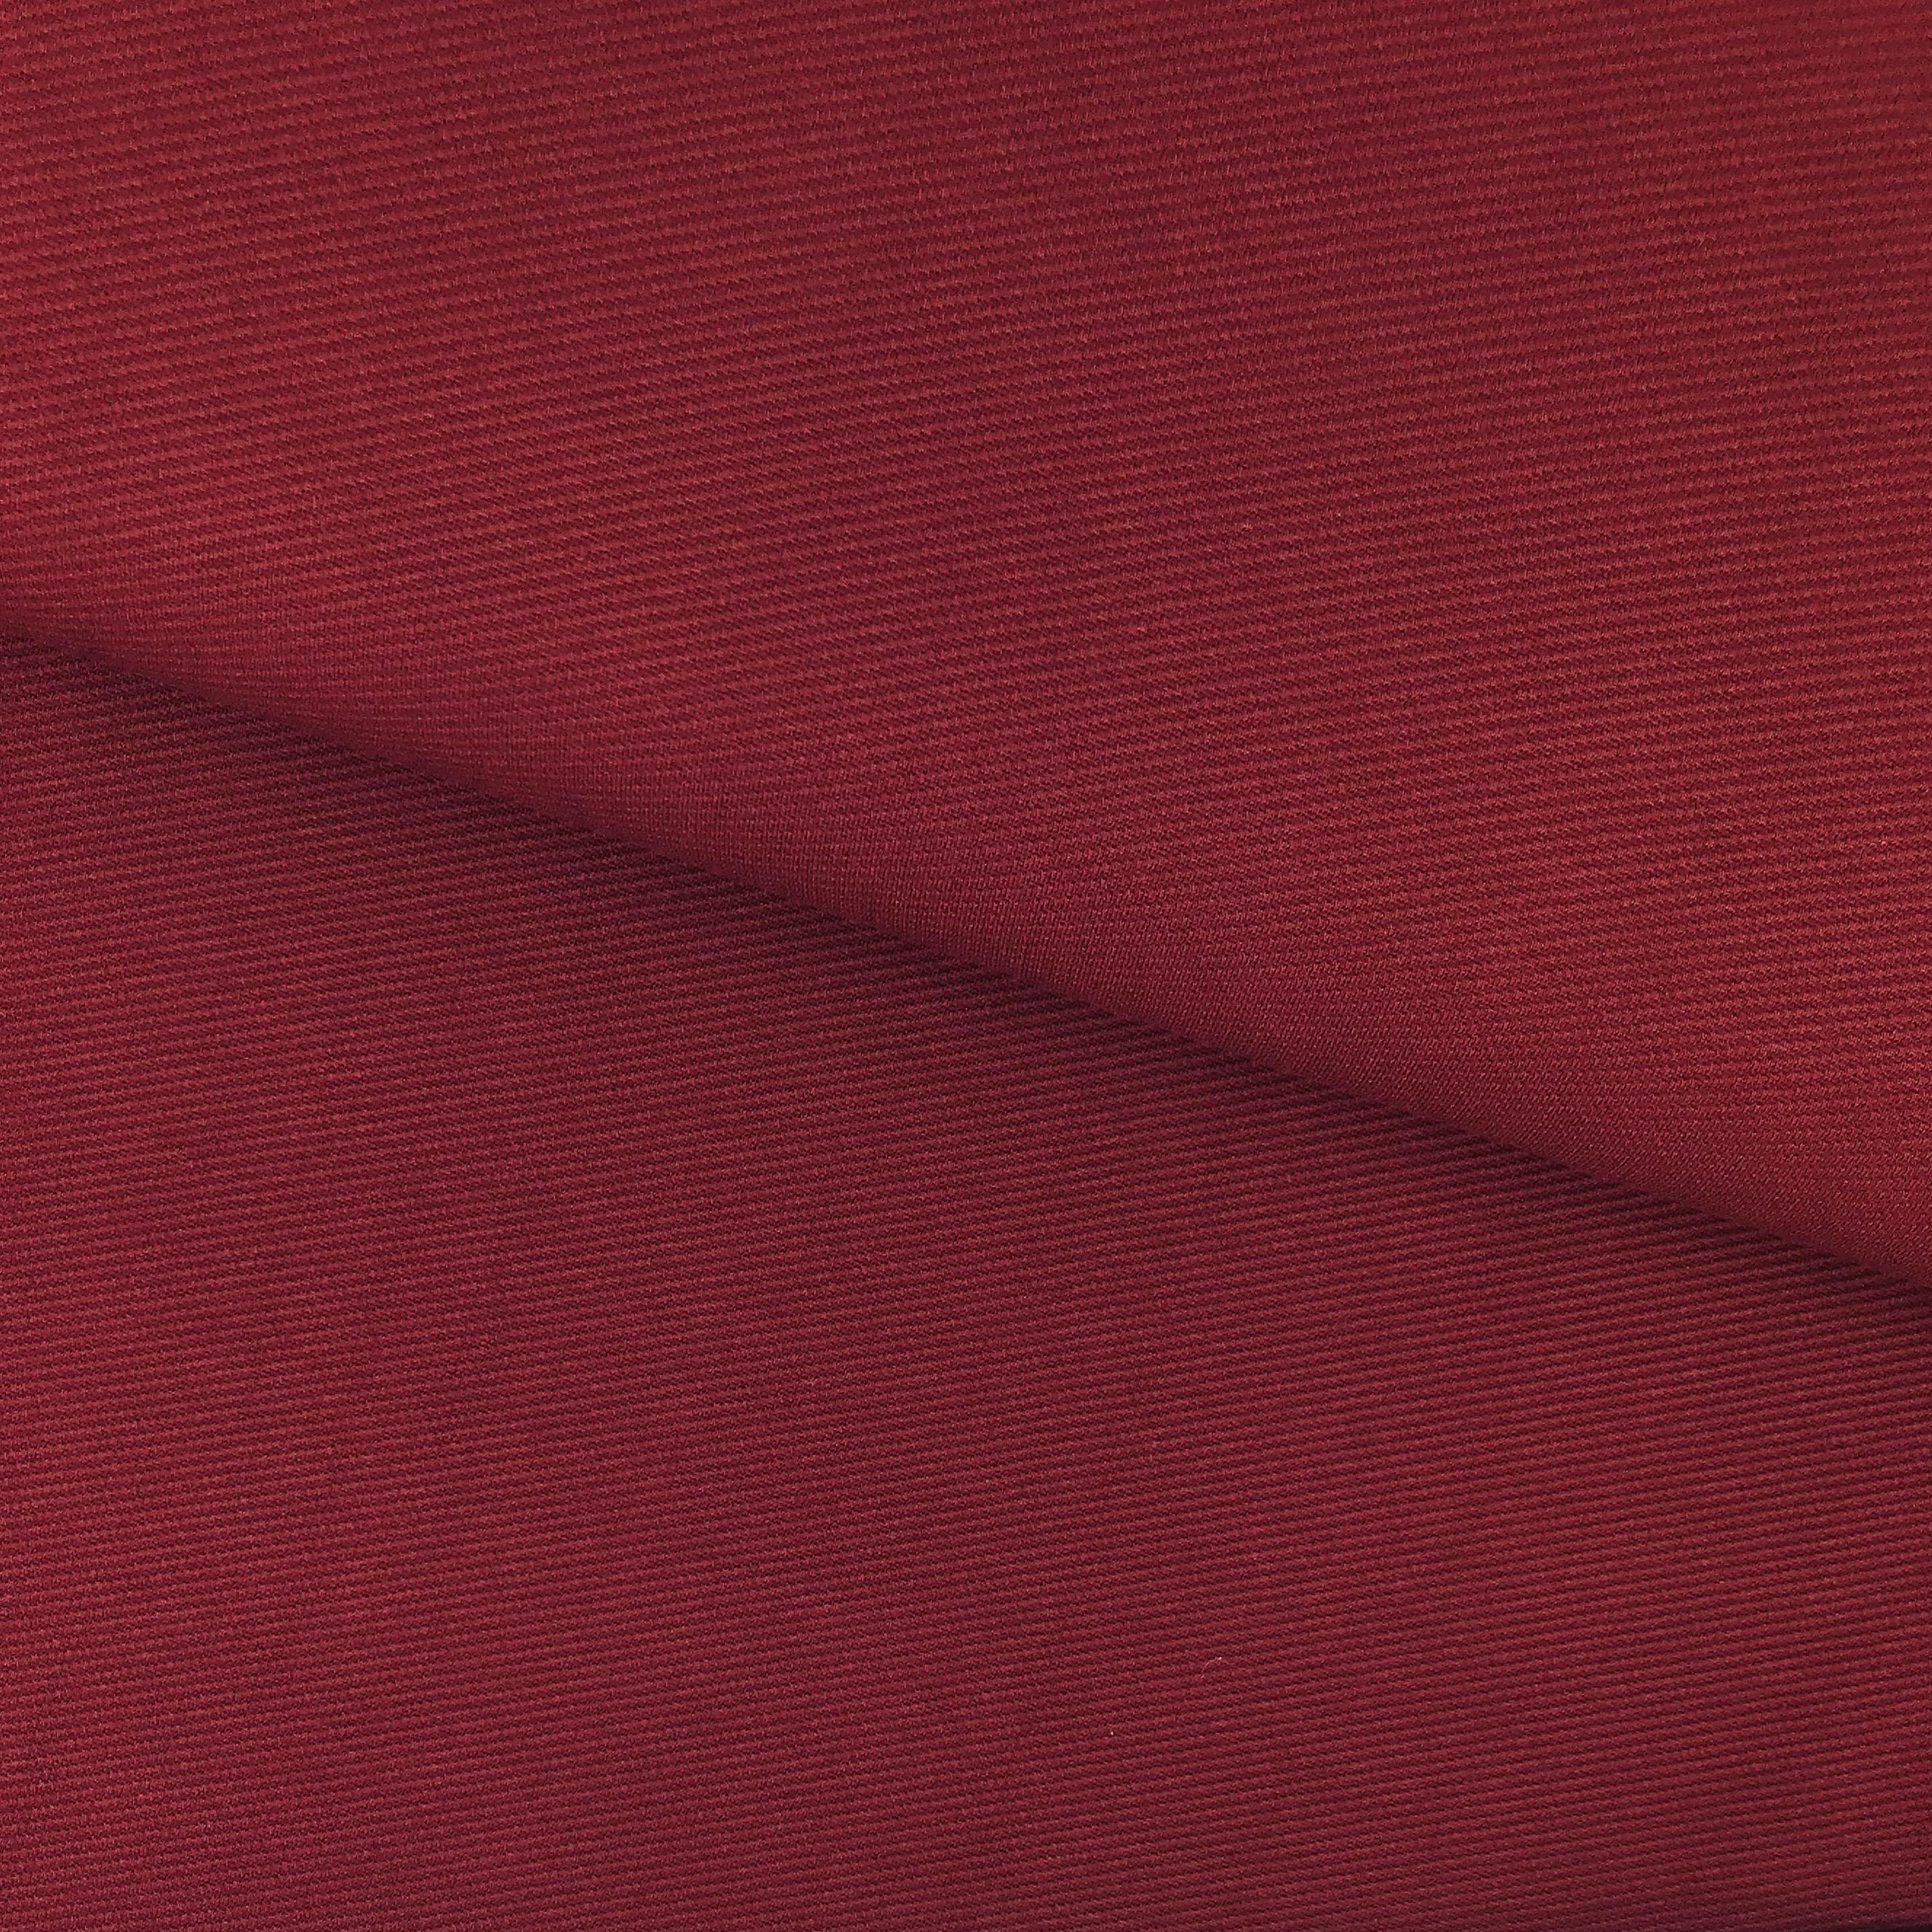 Comfort Romanit Jersey, gerippt, bordeauxrot. Art. SW11246